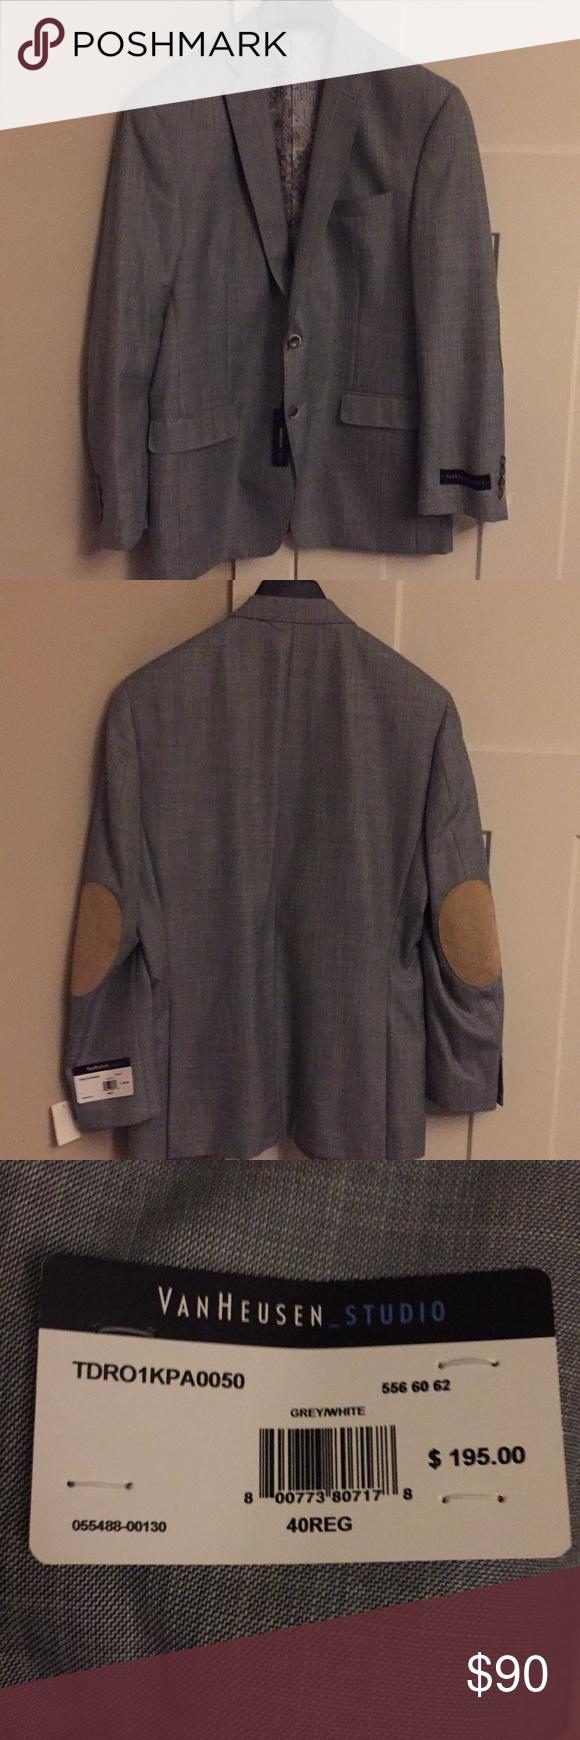 Van Heusen light gray sportscoat with elbow patch NWT